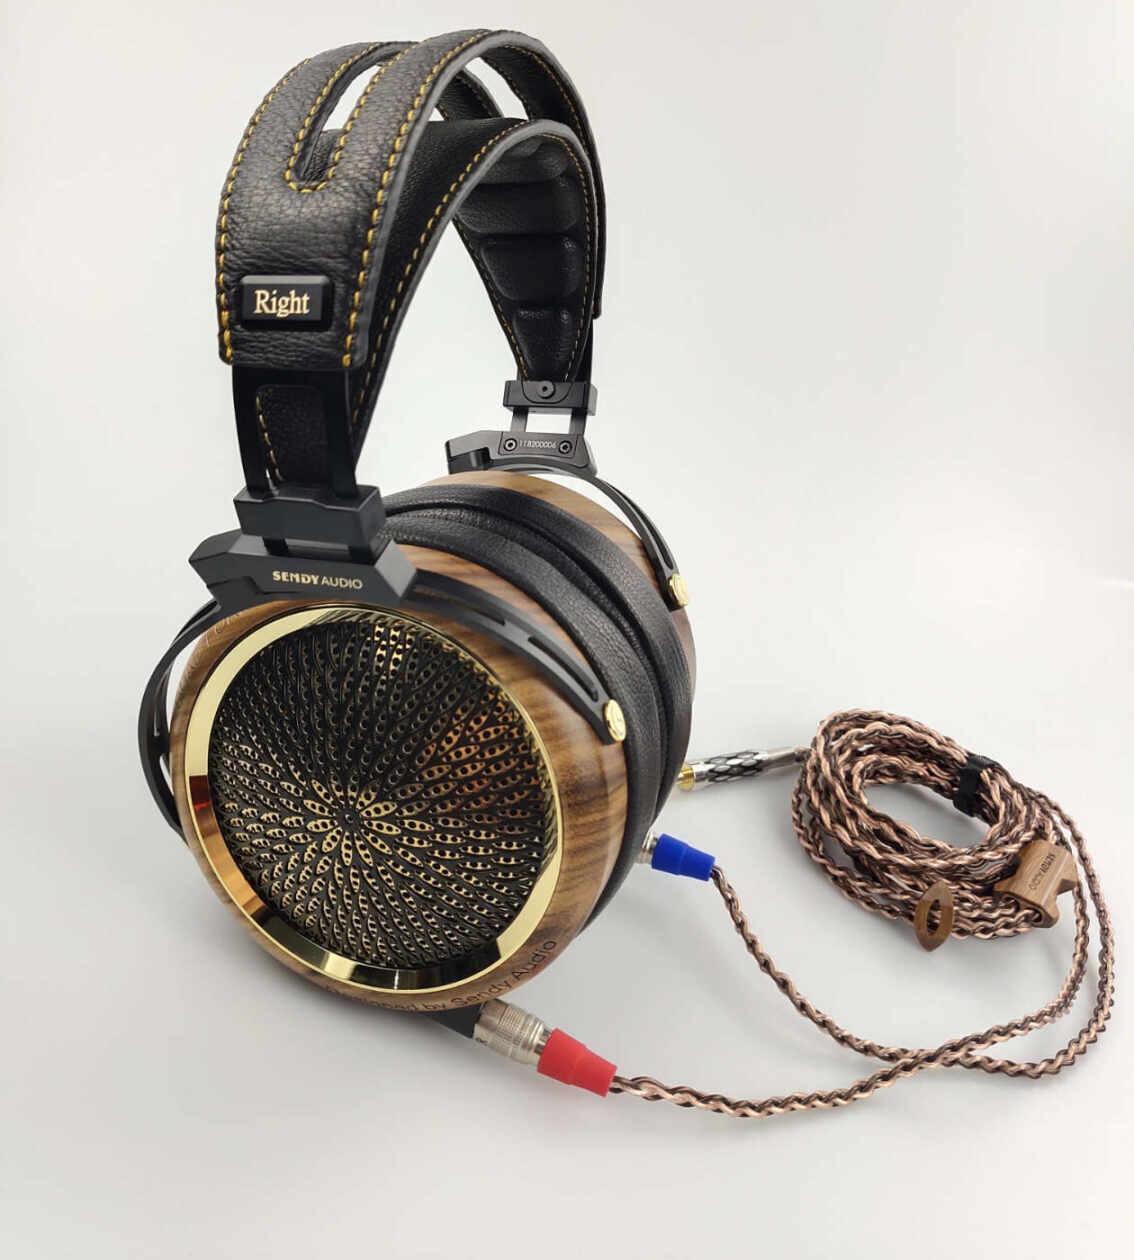 pm-audionext-sendy-audio-peacock